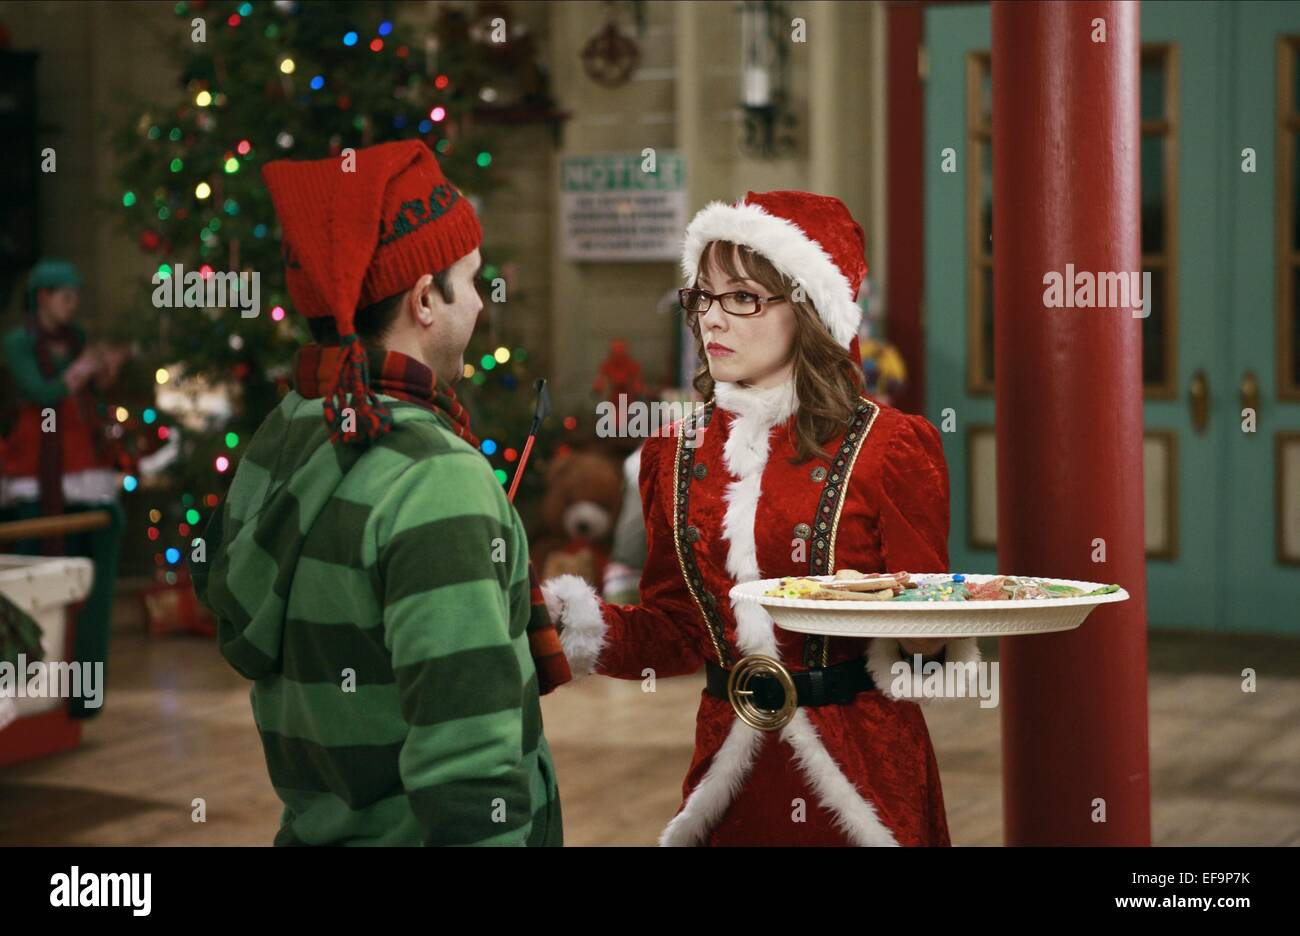 gabe khouth kelly stables santa baby 2 christmas maybe 2009 stock - Santa Baby 2 Christmas Maybe